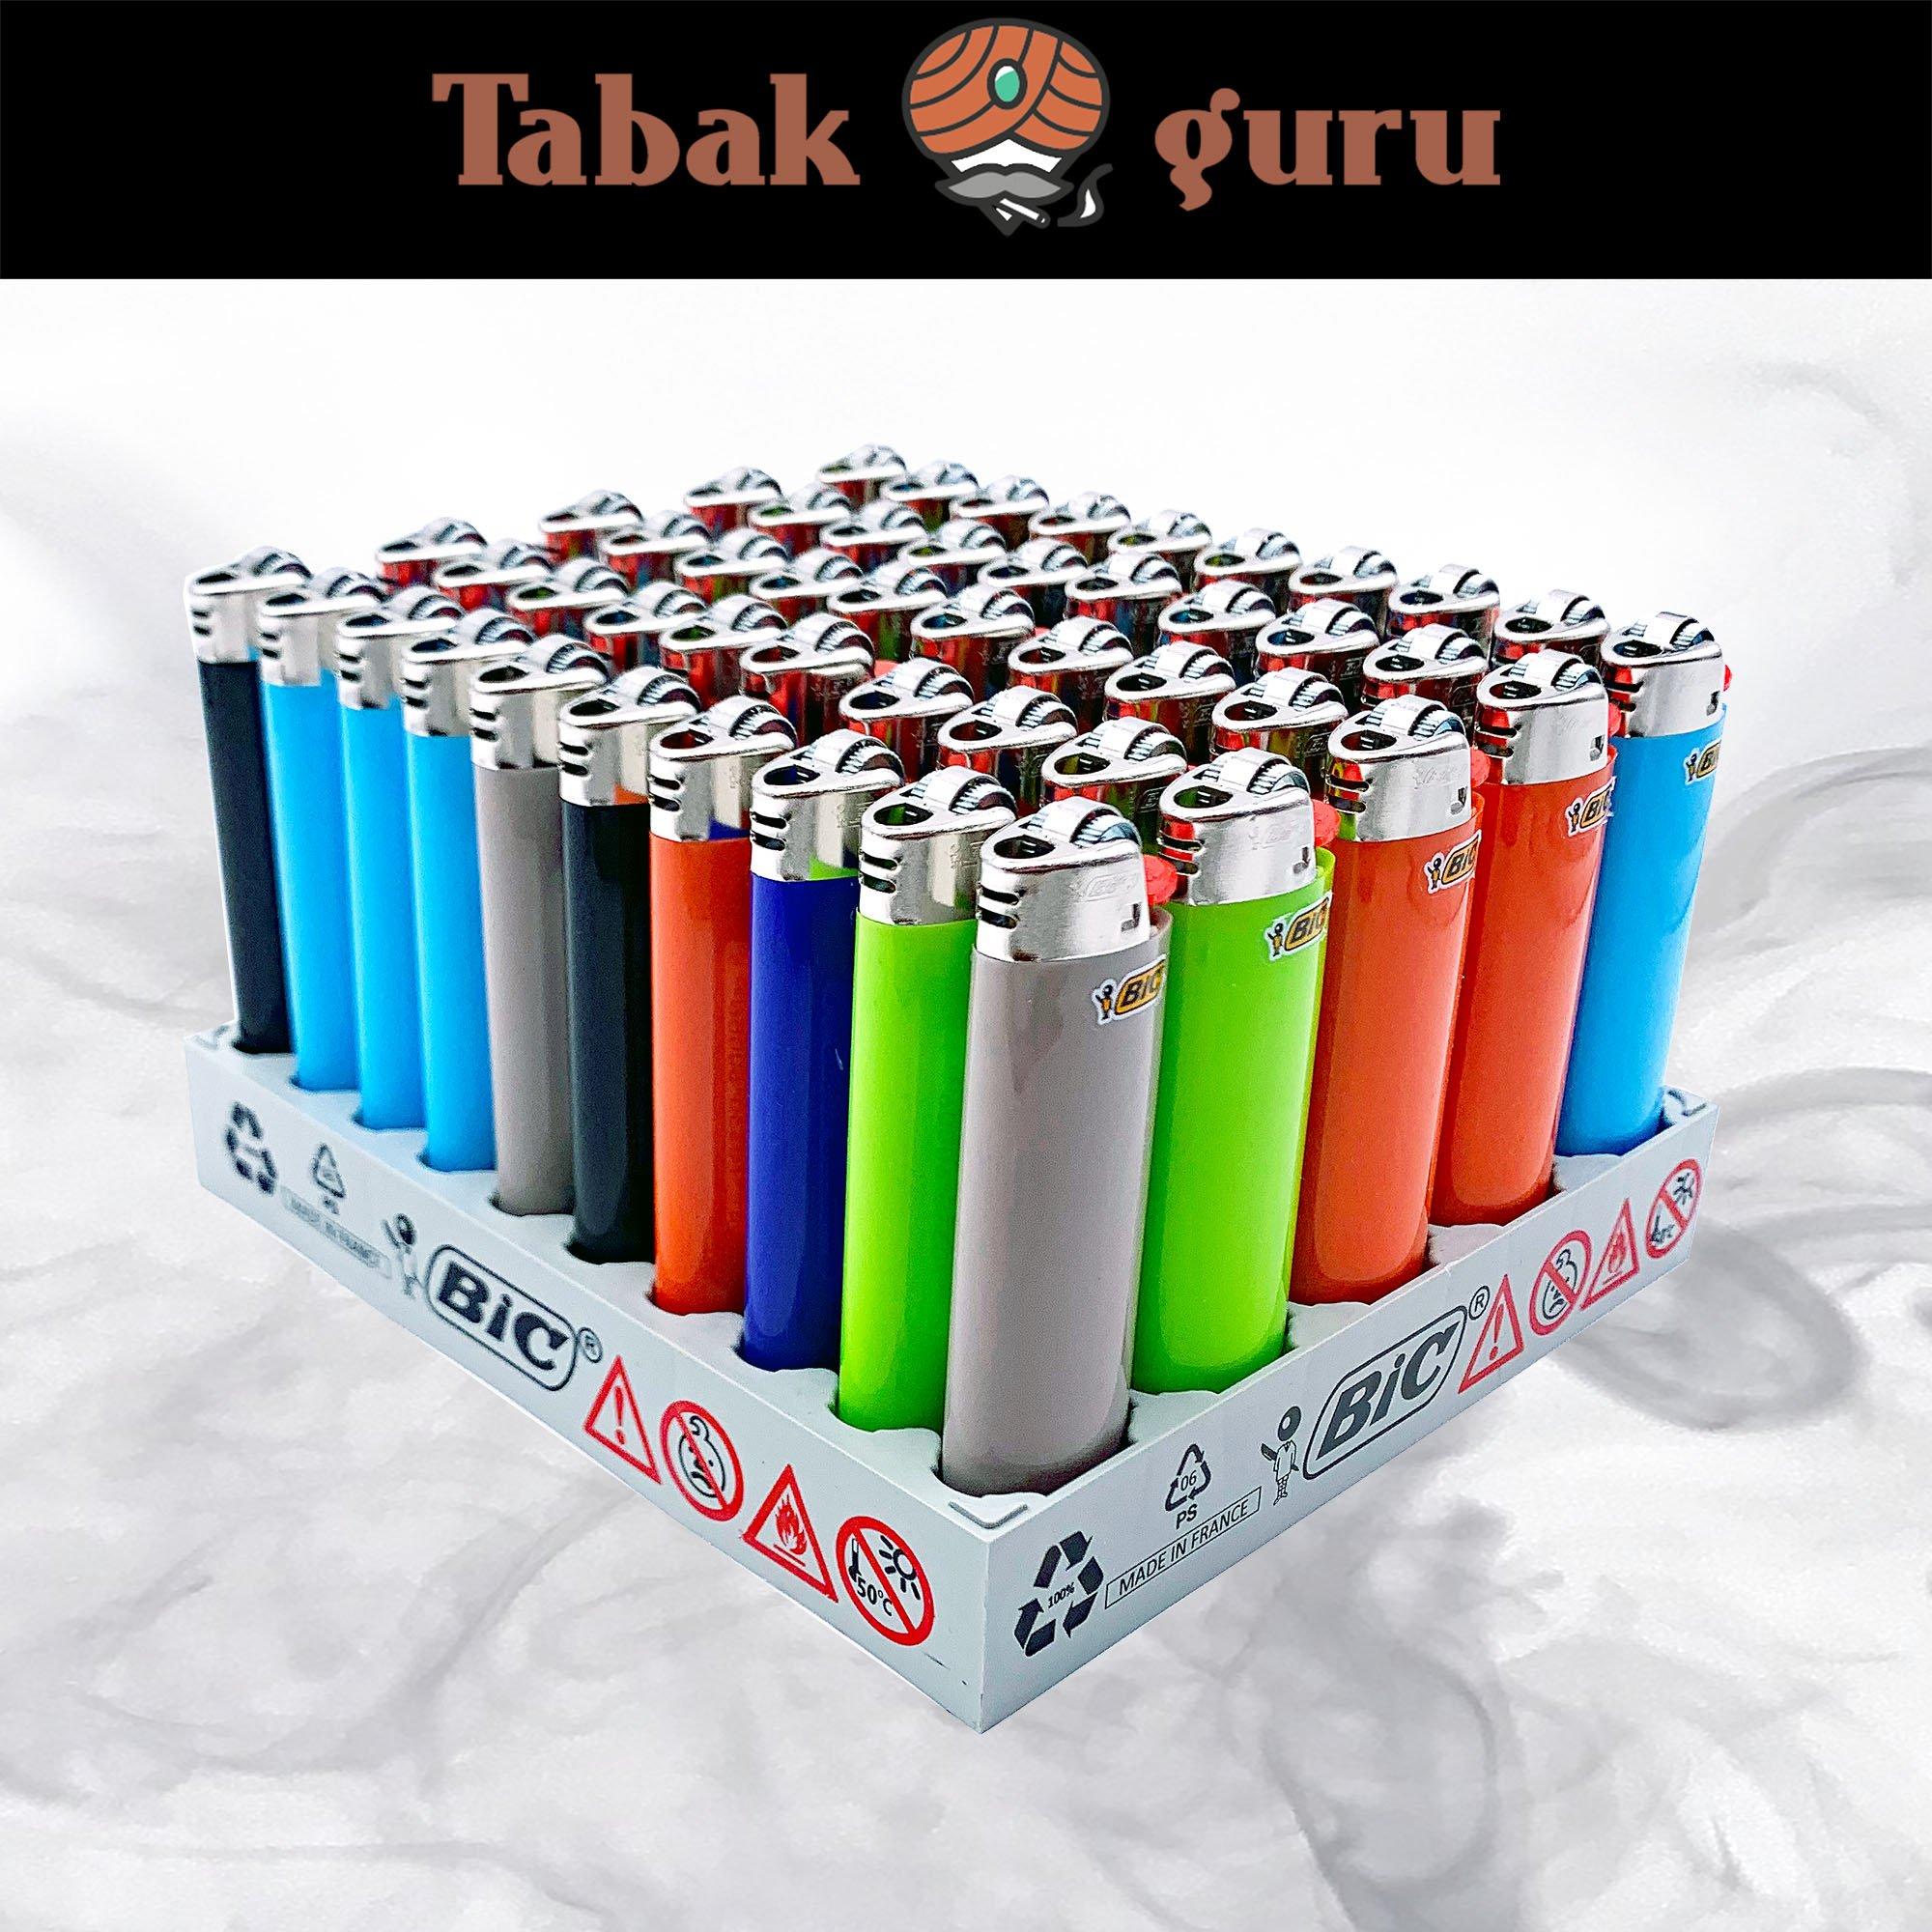 50 BIC Maxi Reibrad Feuerzeug verschiedene Farben